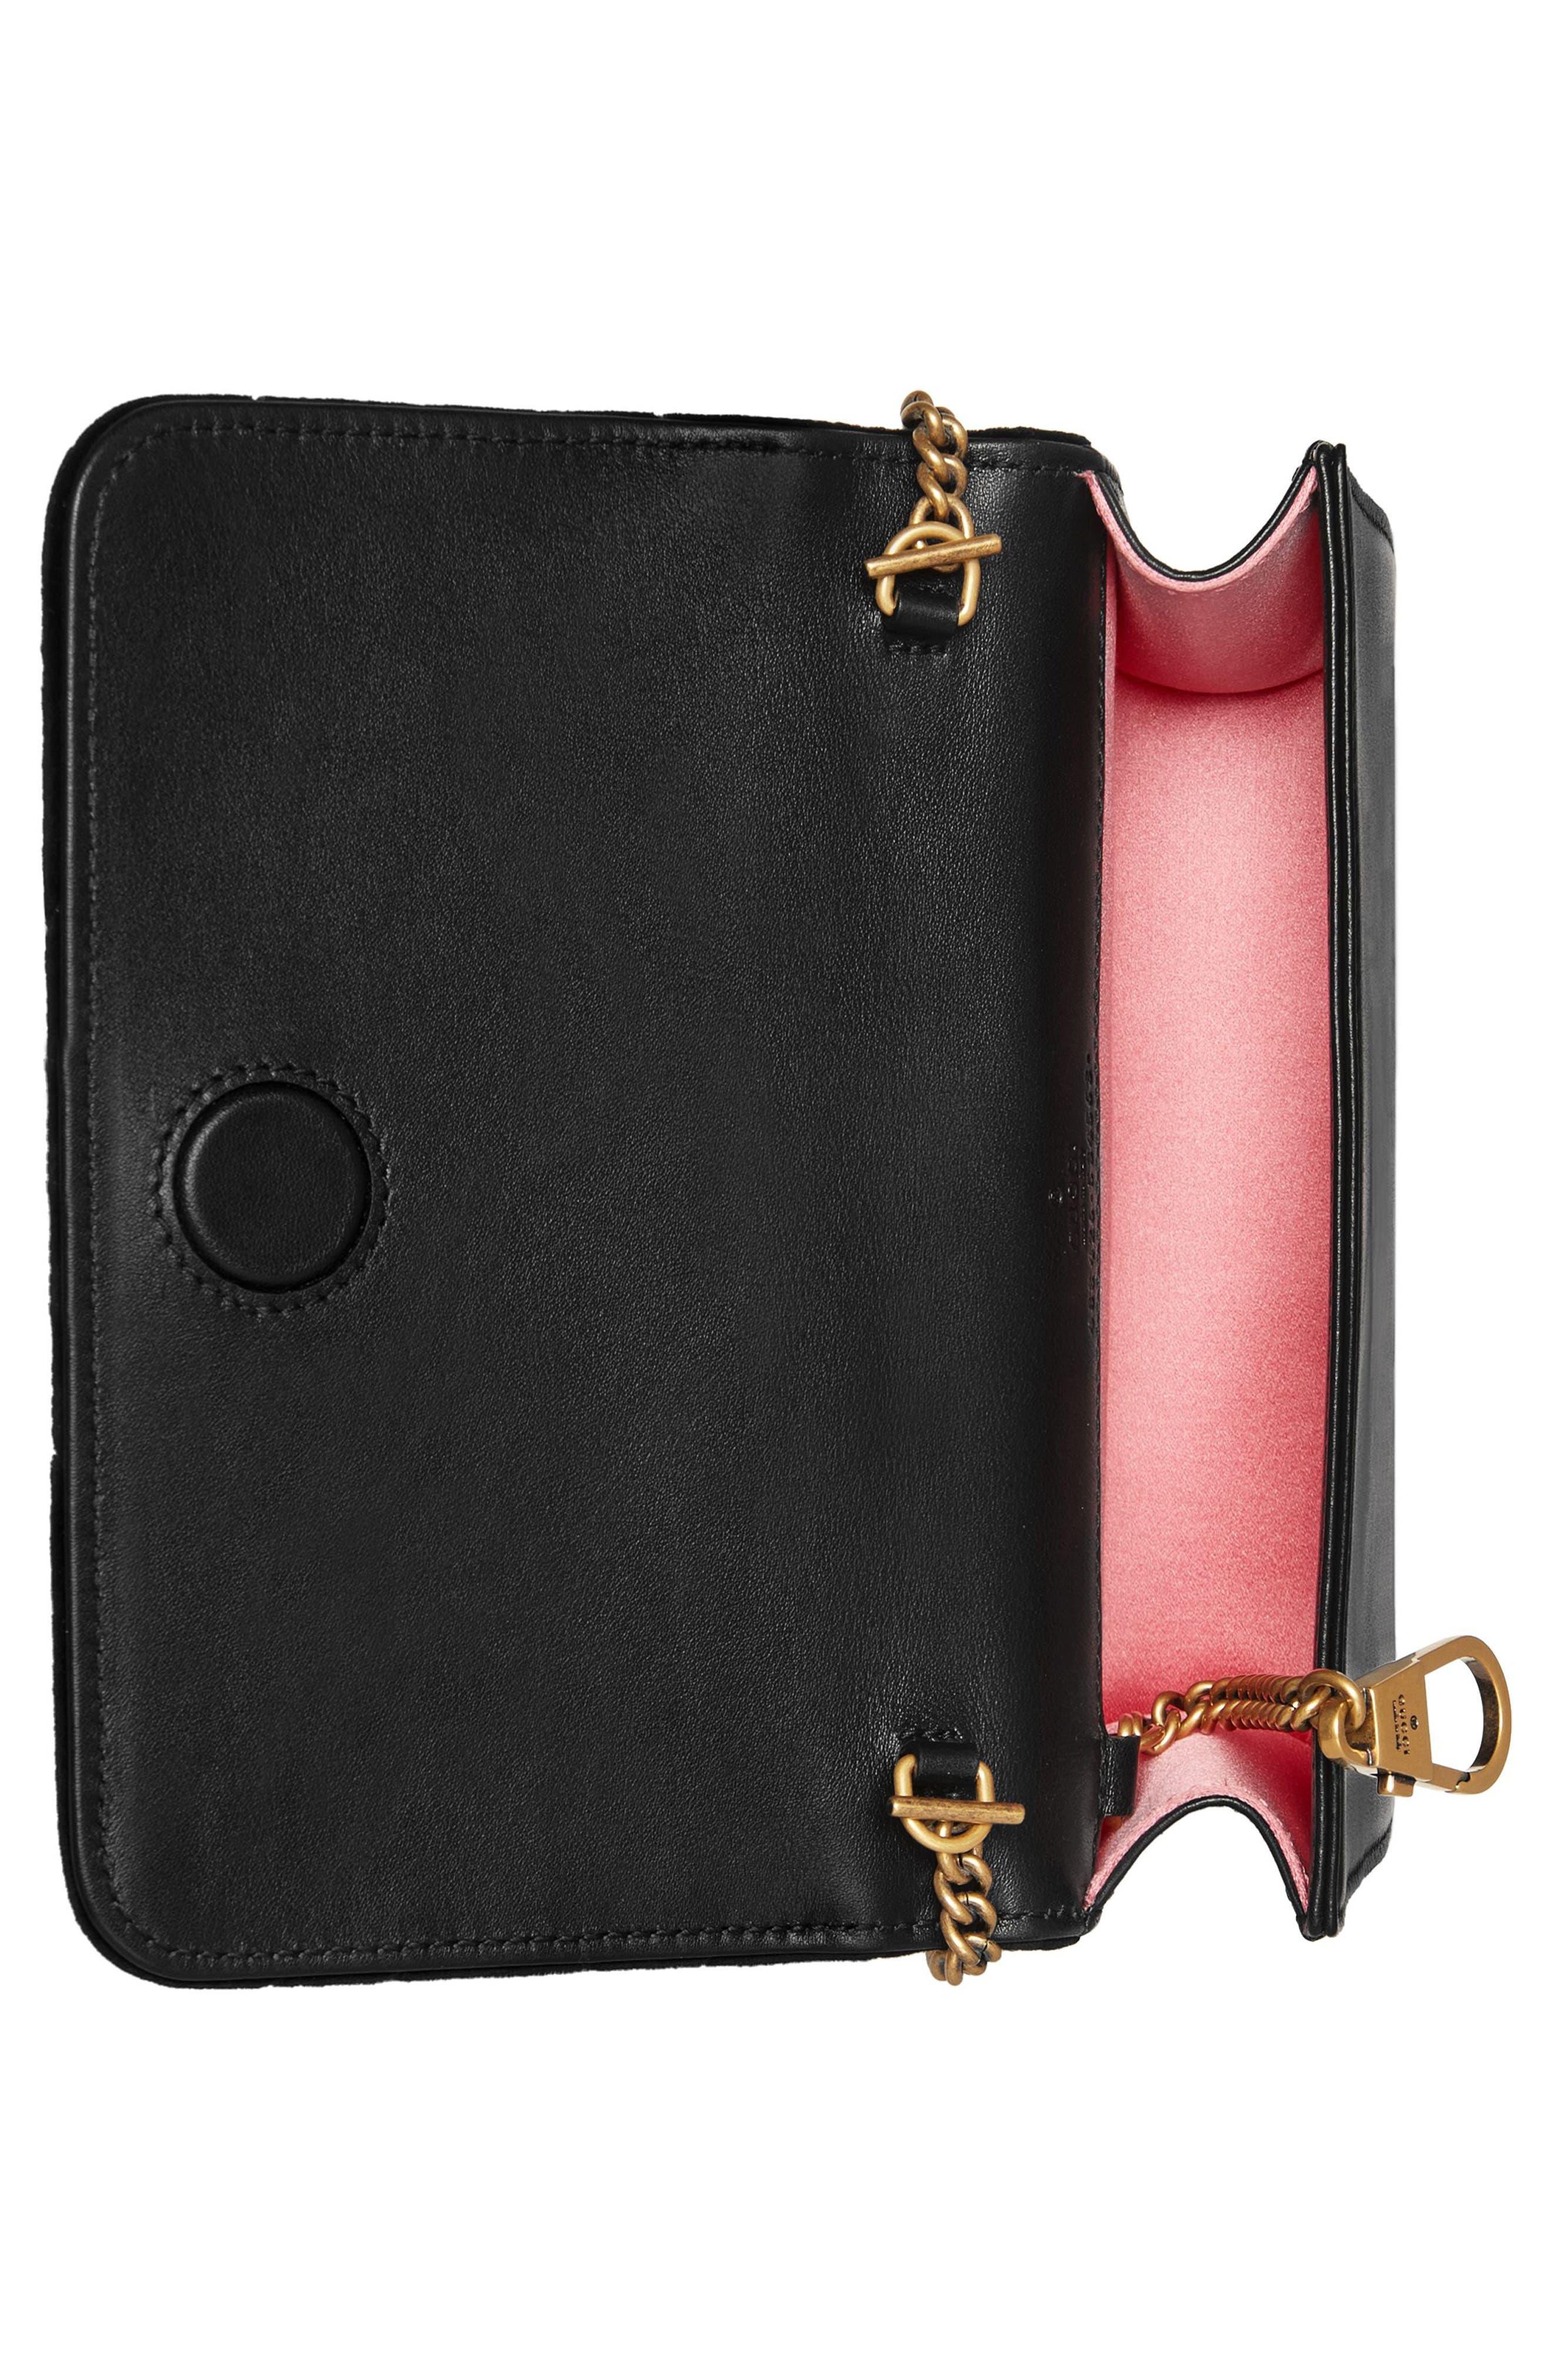 GG Marmont 2.0 Matelassé Velvet Shoulder Bag,                             Alternate thumbnail 2, color,                             NERO/ NERO